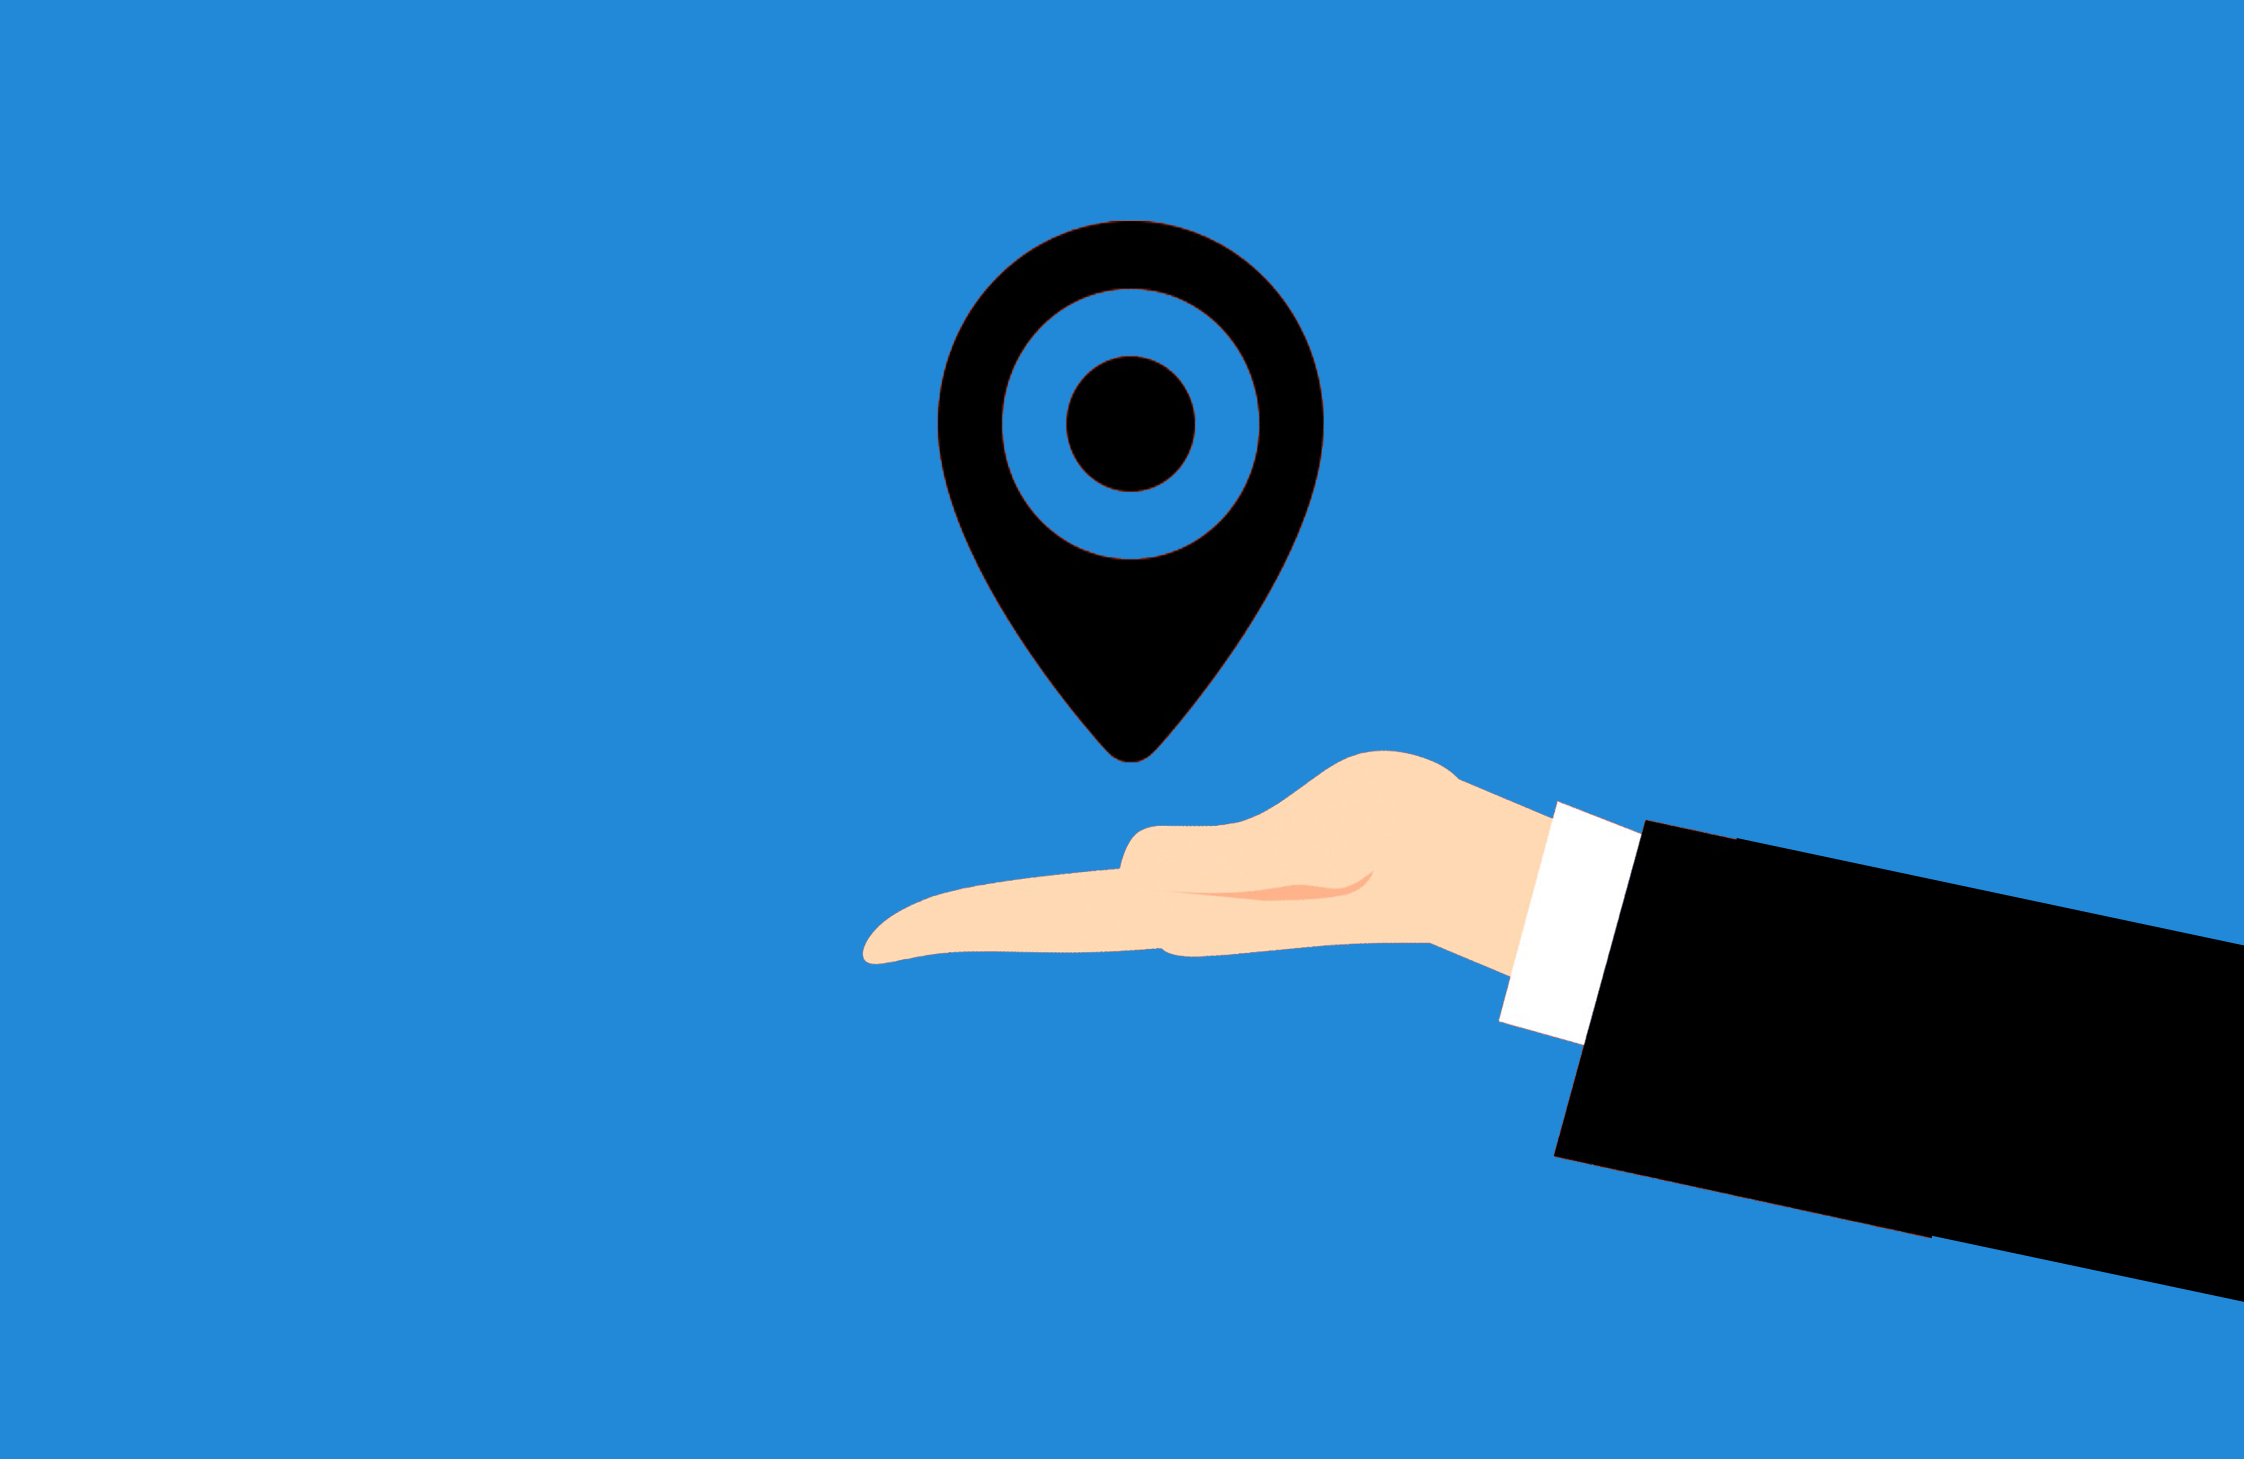 asset trackers, gps, fleet, telematics, zenduit, location